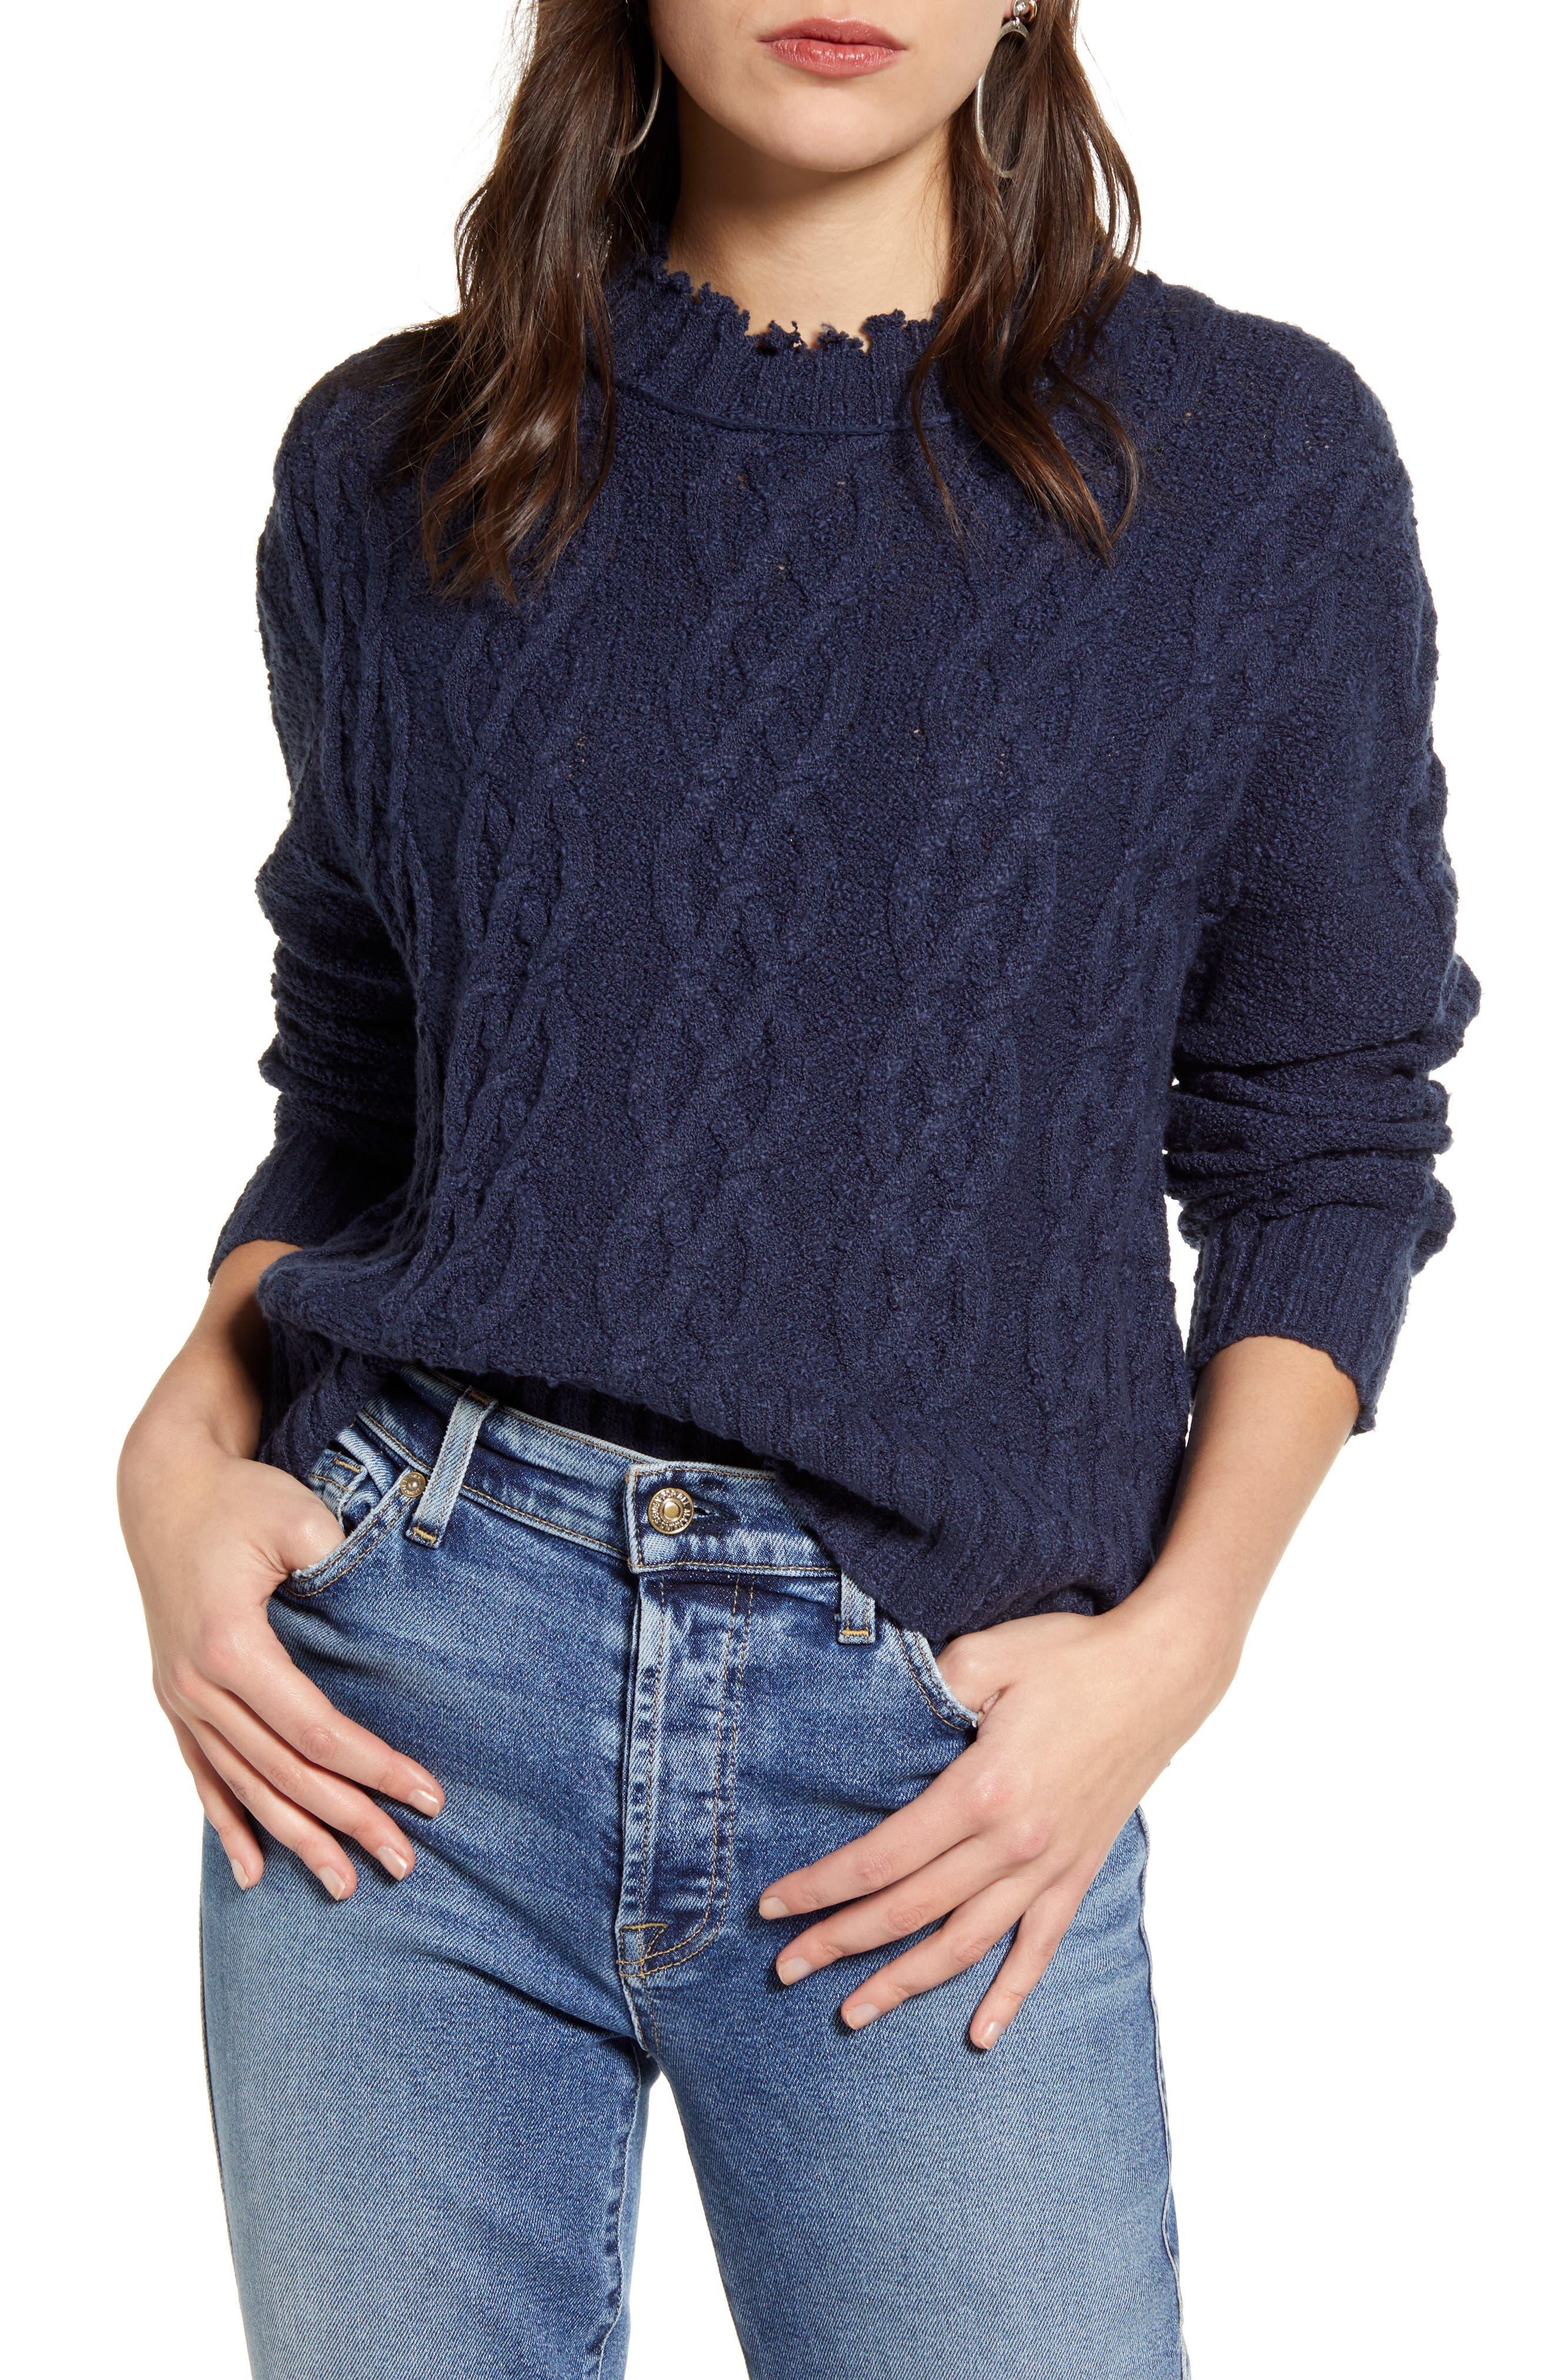 Treasure & Bond Cable Cotton Blend Sweater